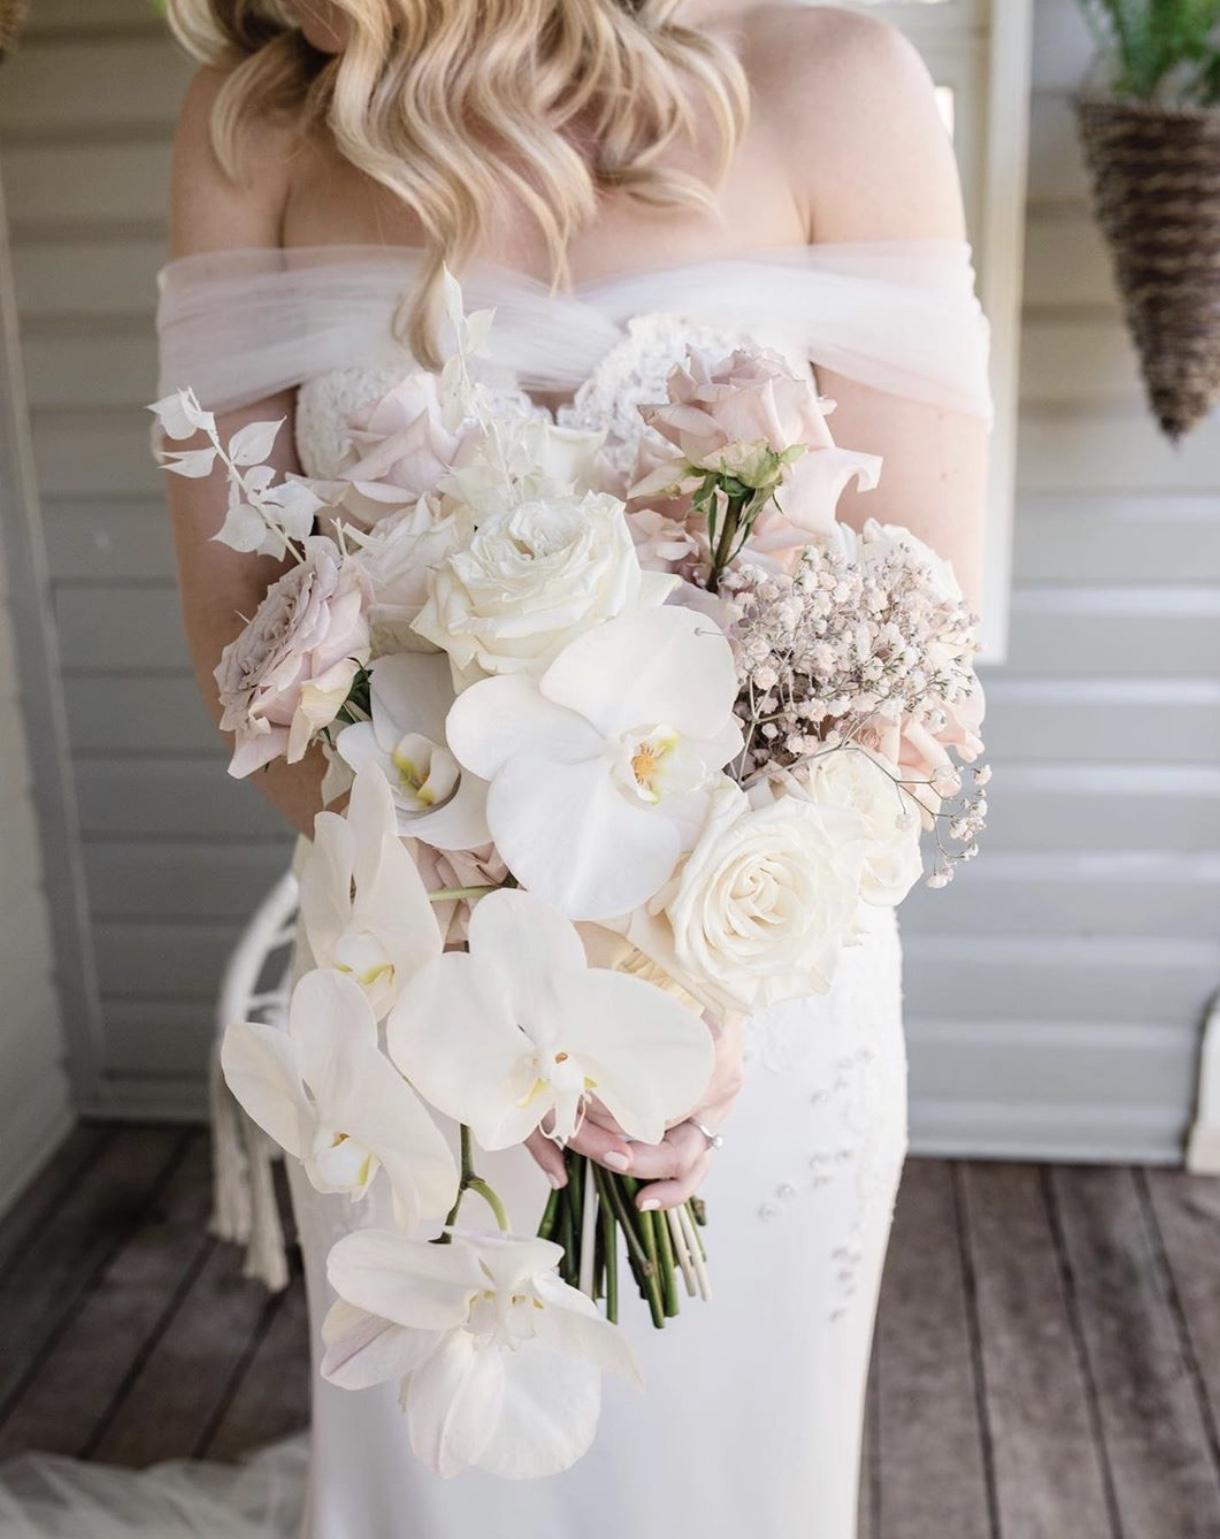 Q+A: MOON BLOOM & CO | LUXURIOUS WEDDING FLORALS BRISBANE QLD